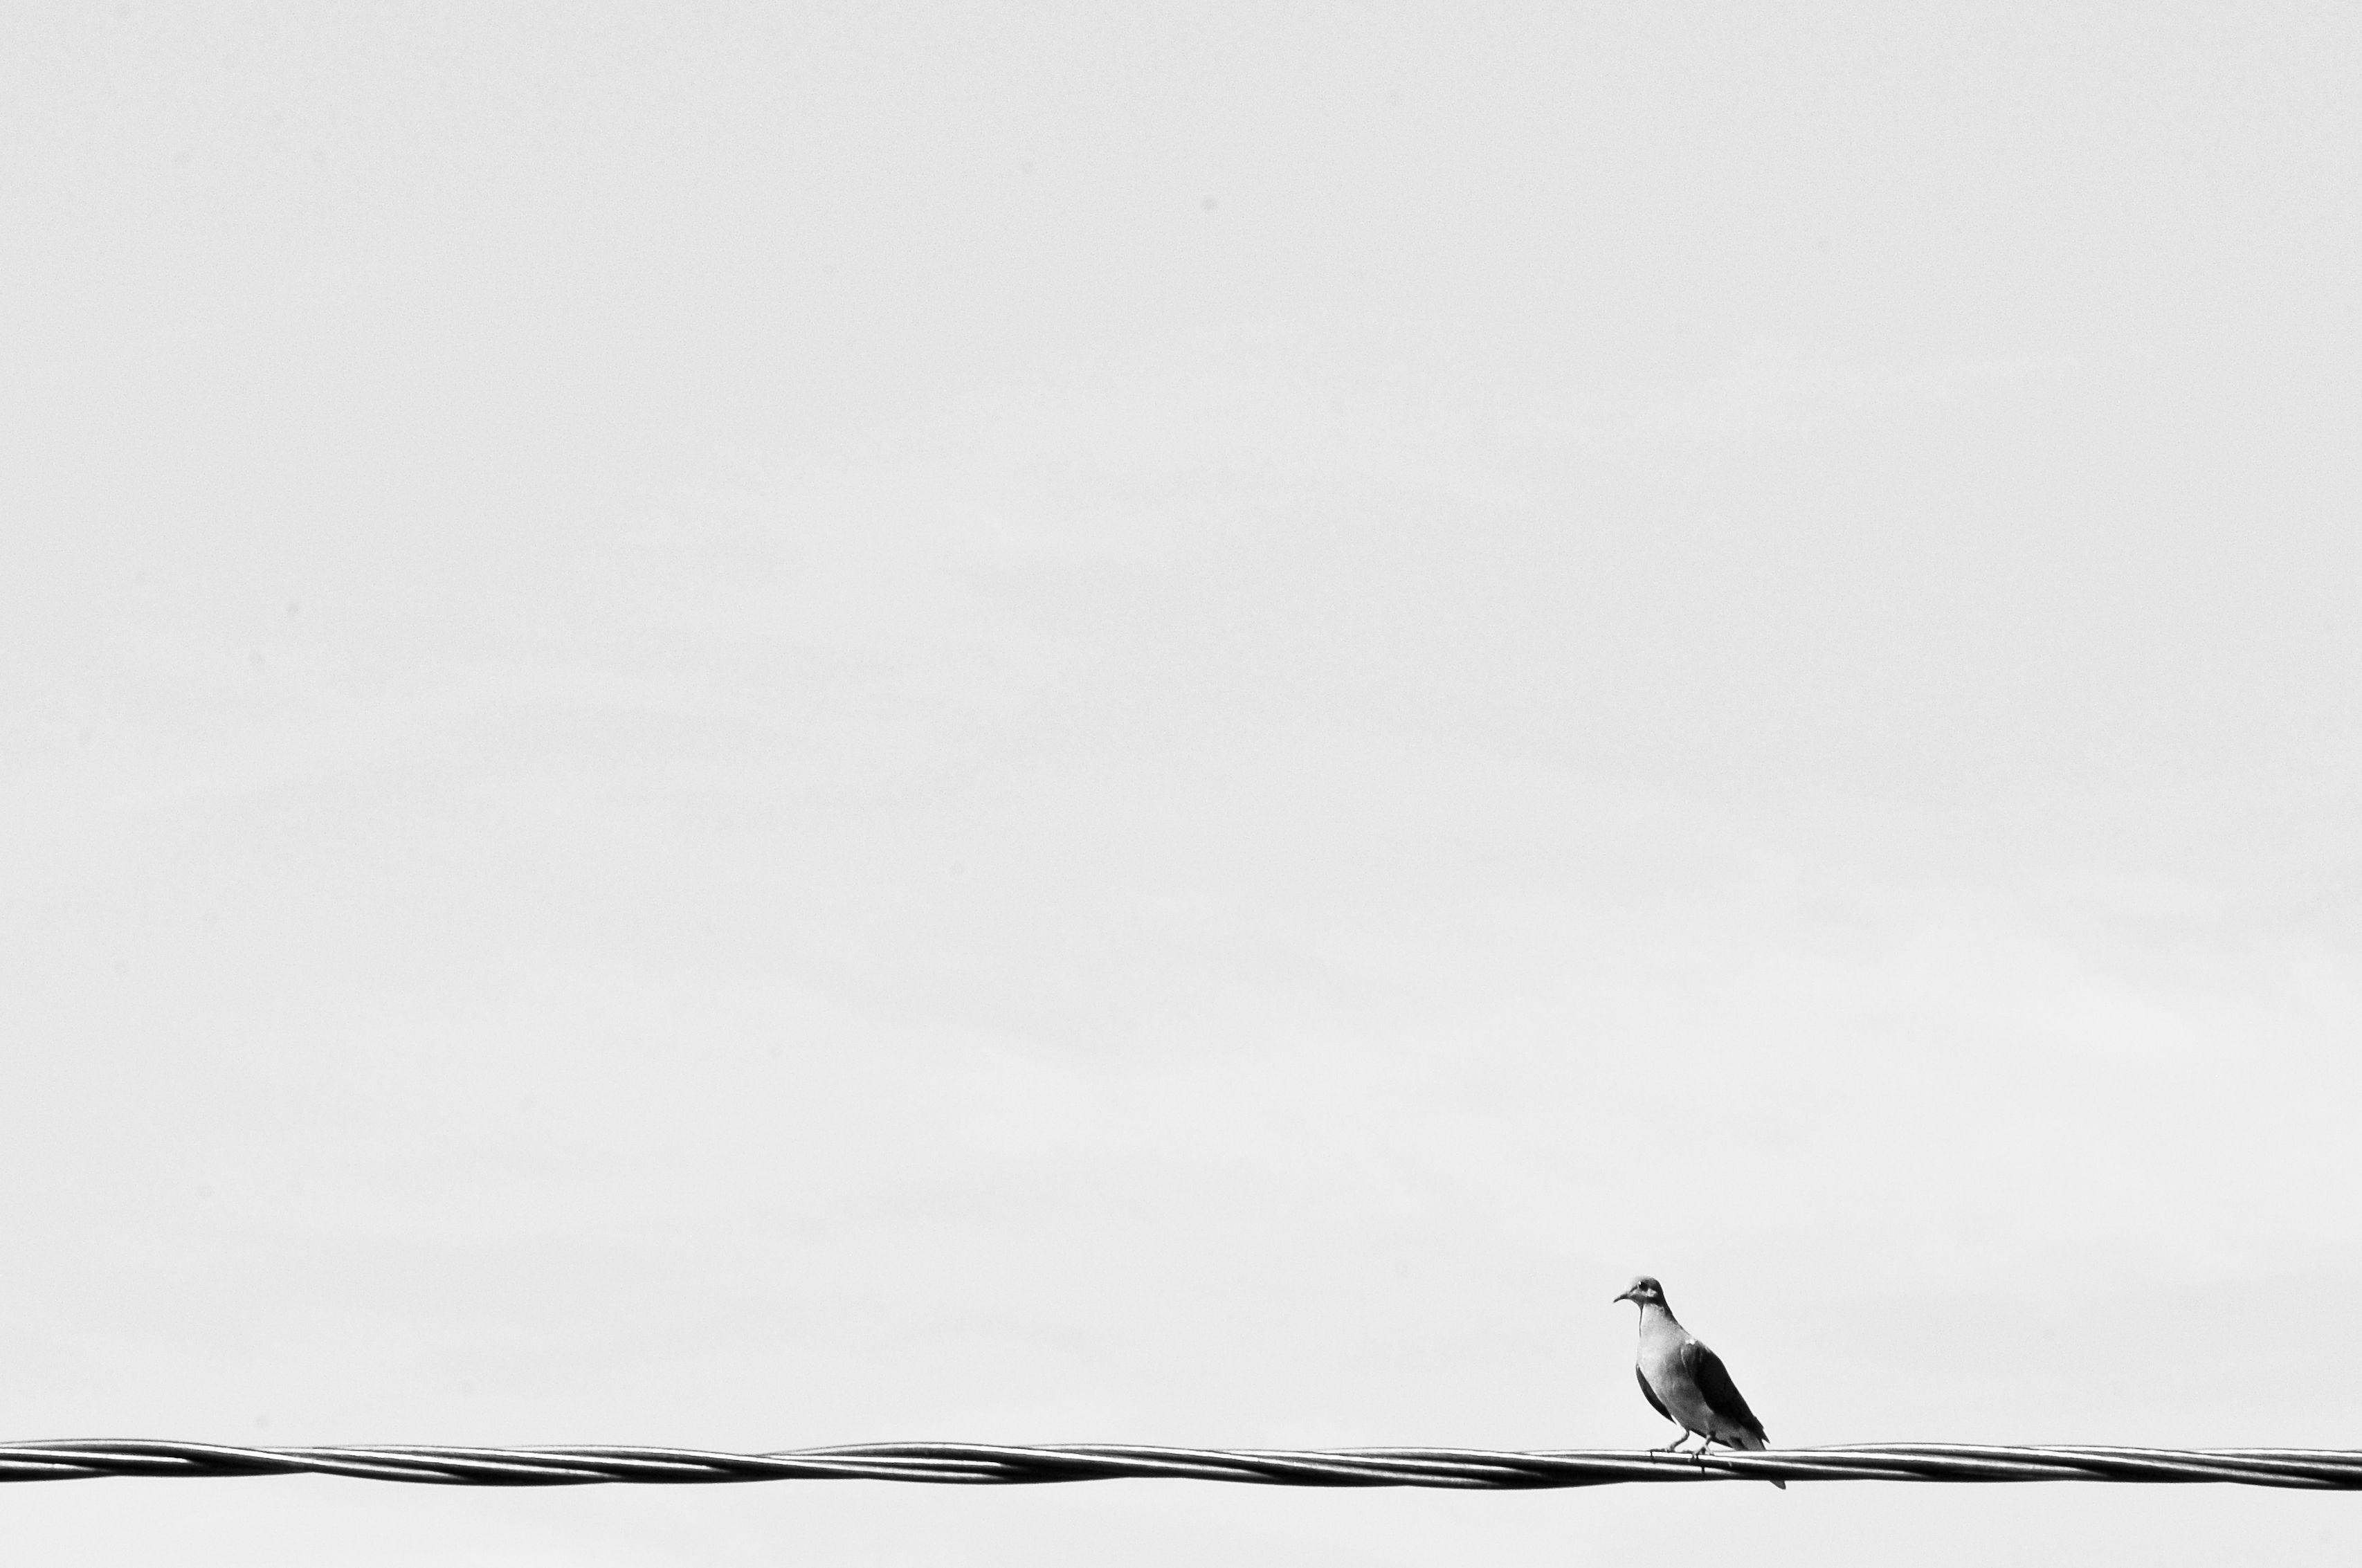 fotógrafo : Henrique Fernandes